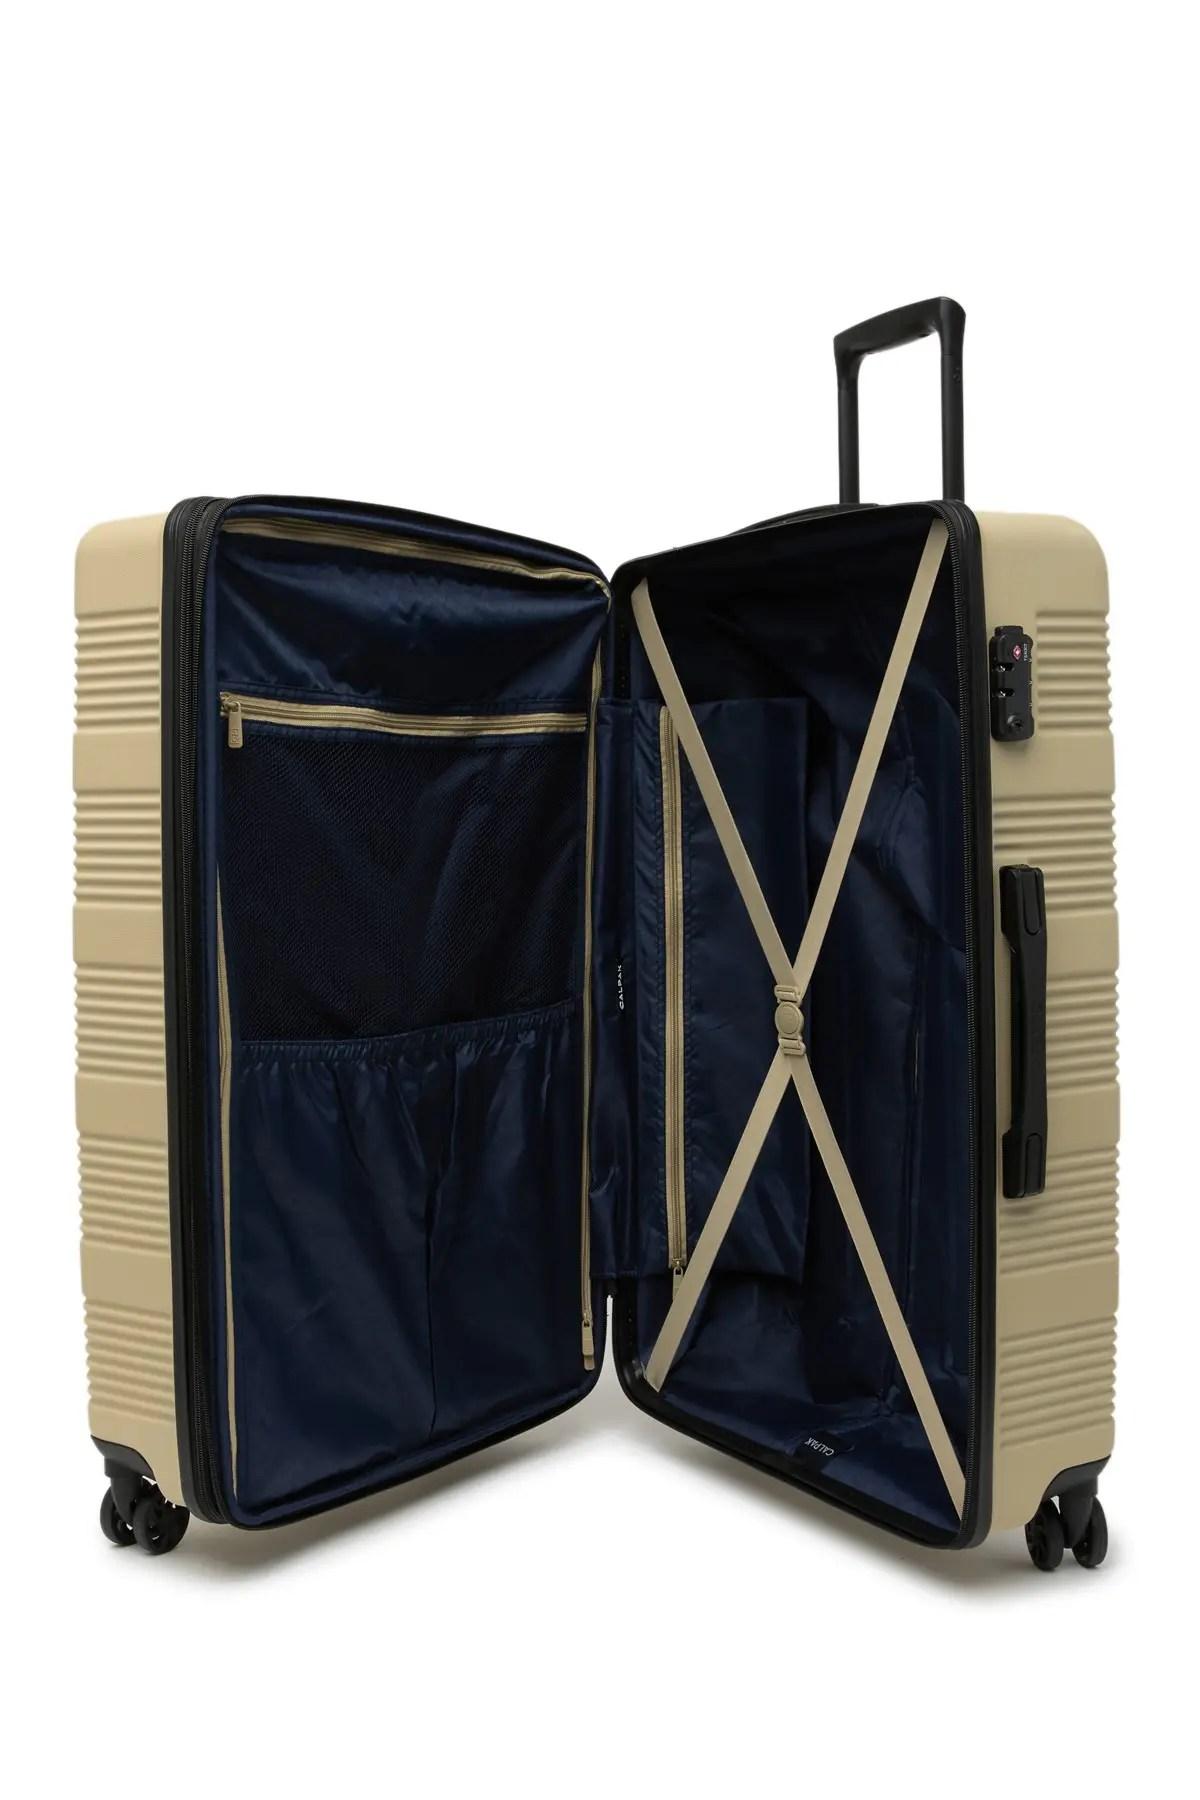 calpak luggage indio 4 piece travel set nordstrom rack